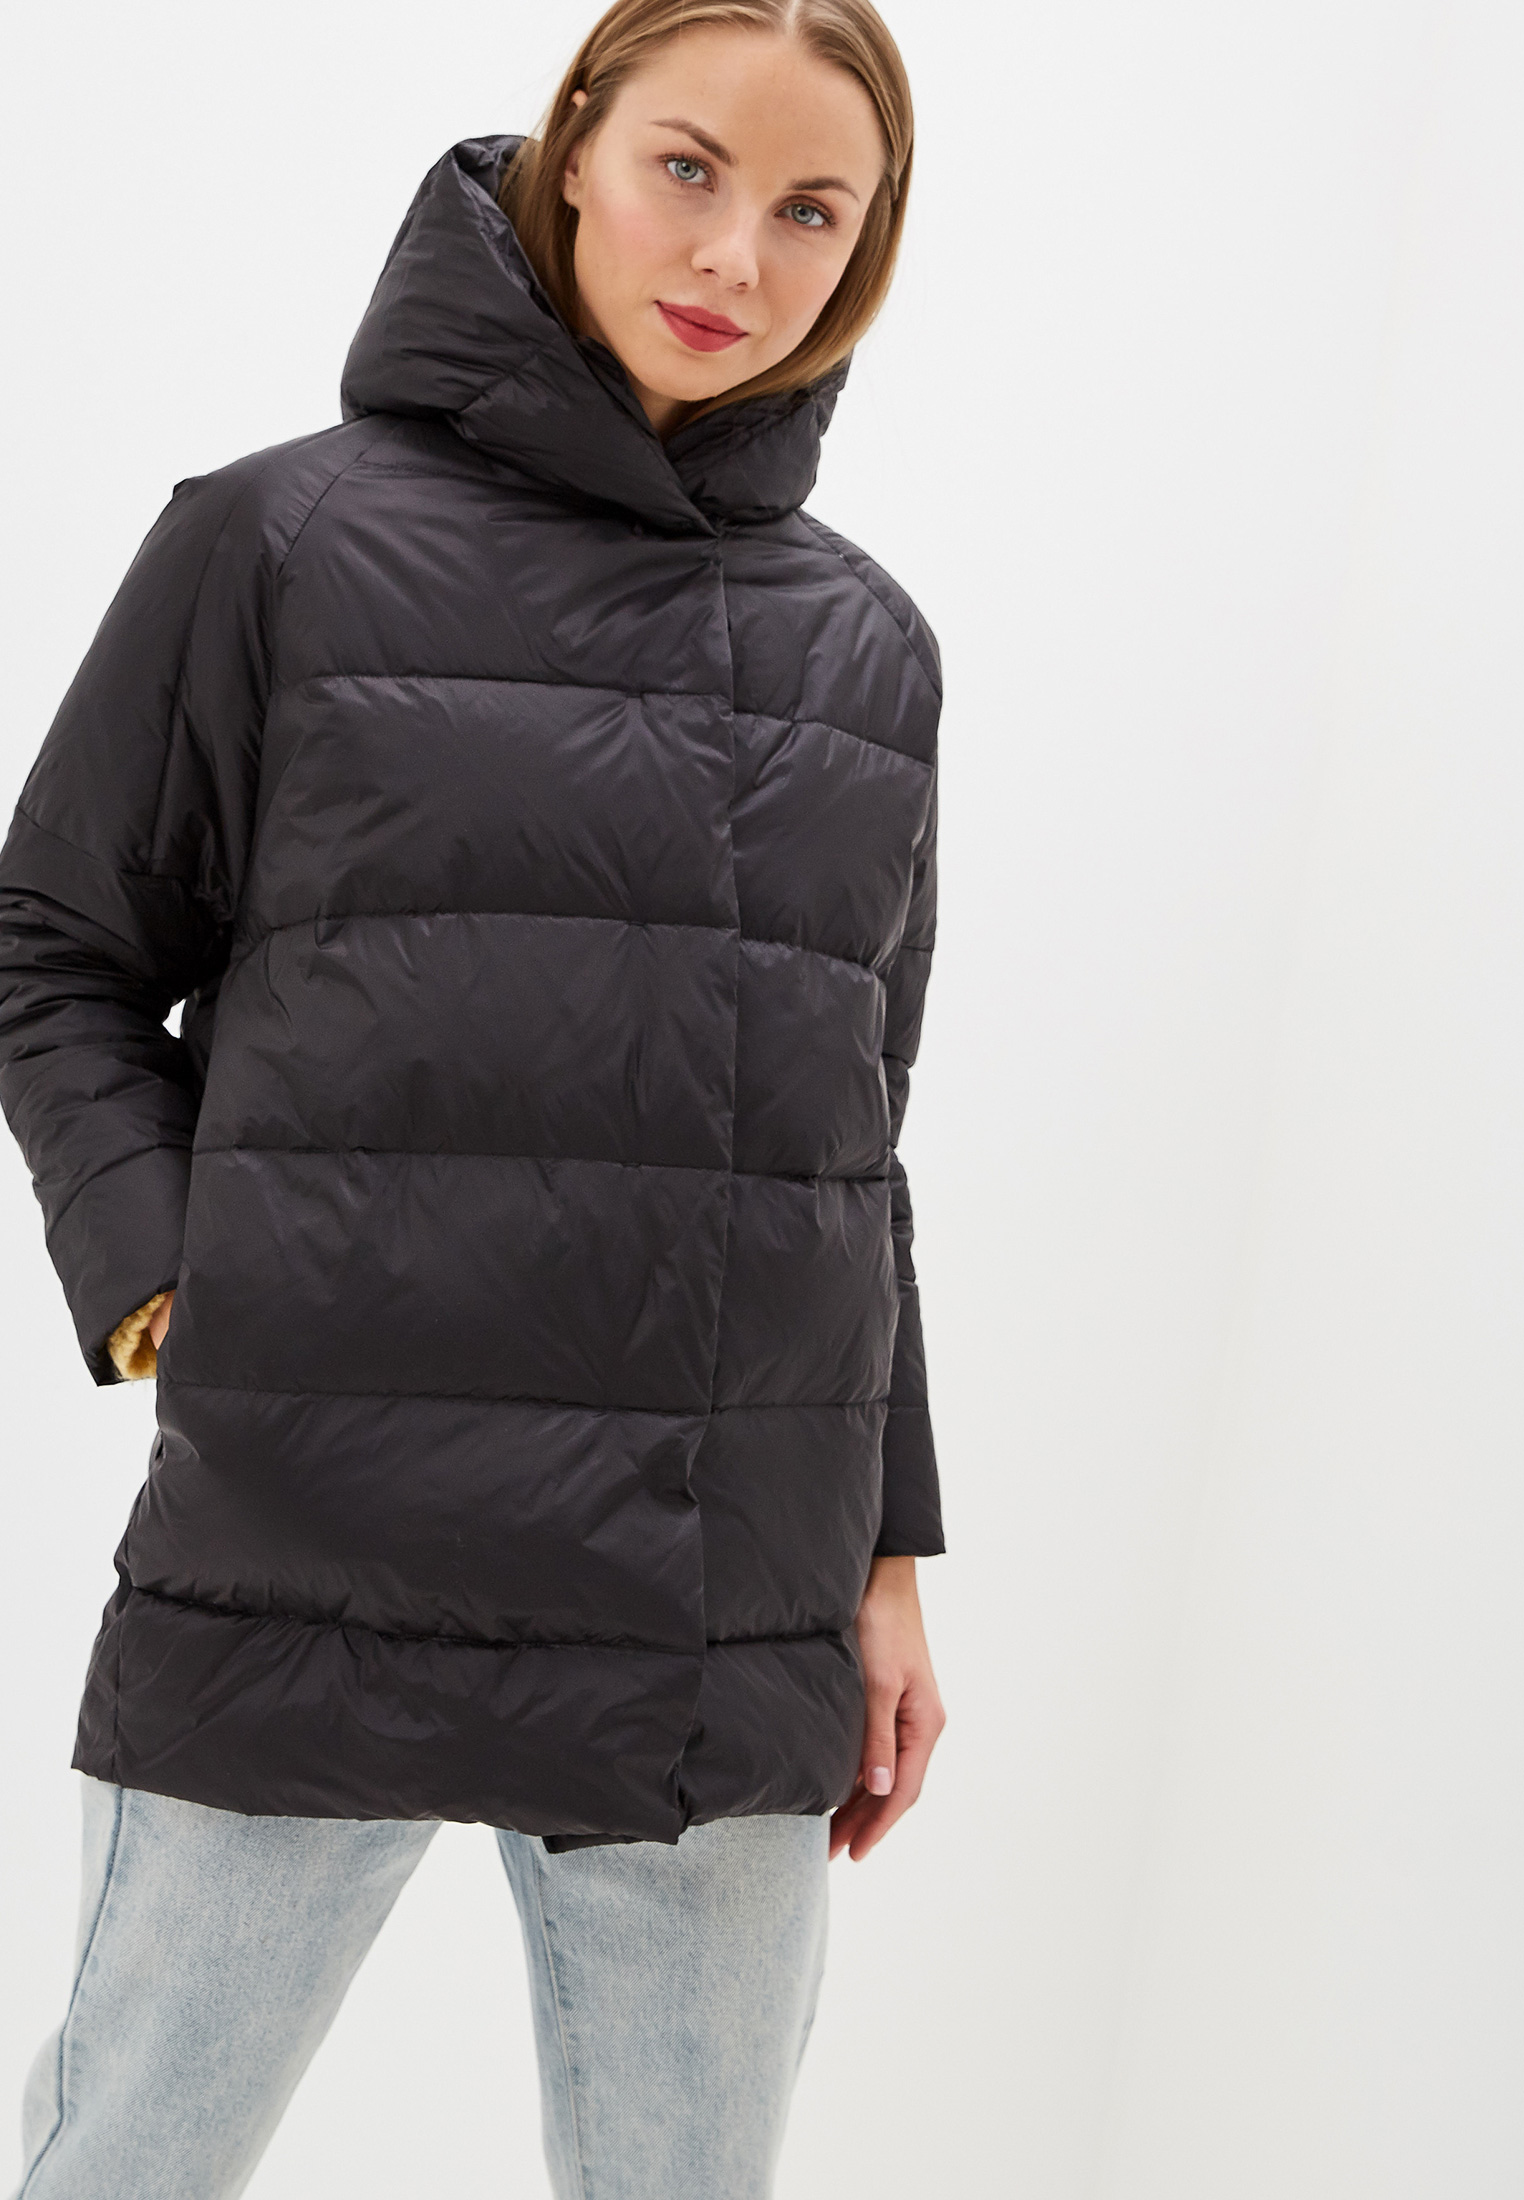 Пуховик, Savage, цвет: черный. Артикул: SA004EWGESC5. Одежда / Верхняя одежда / Пуховики и зимние куртки